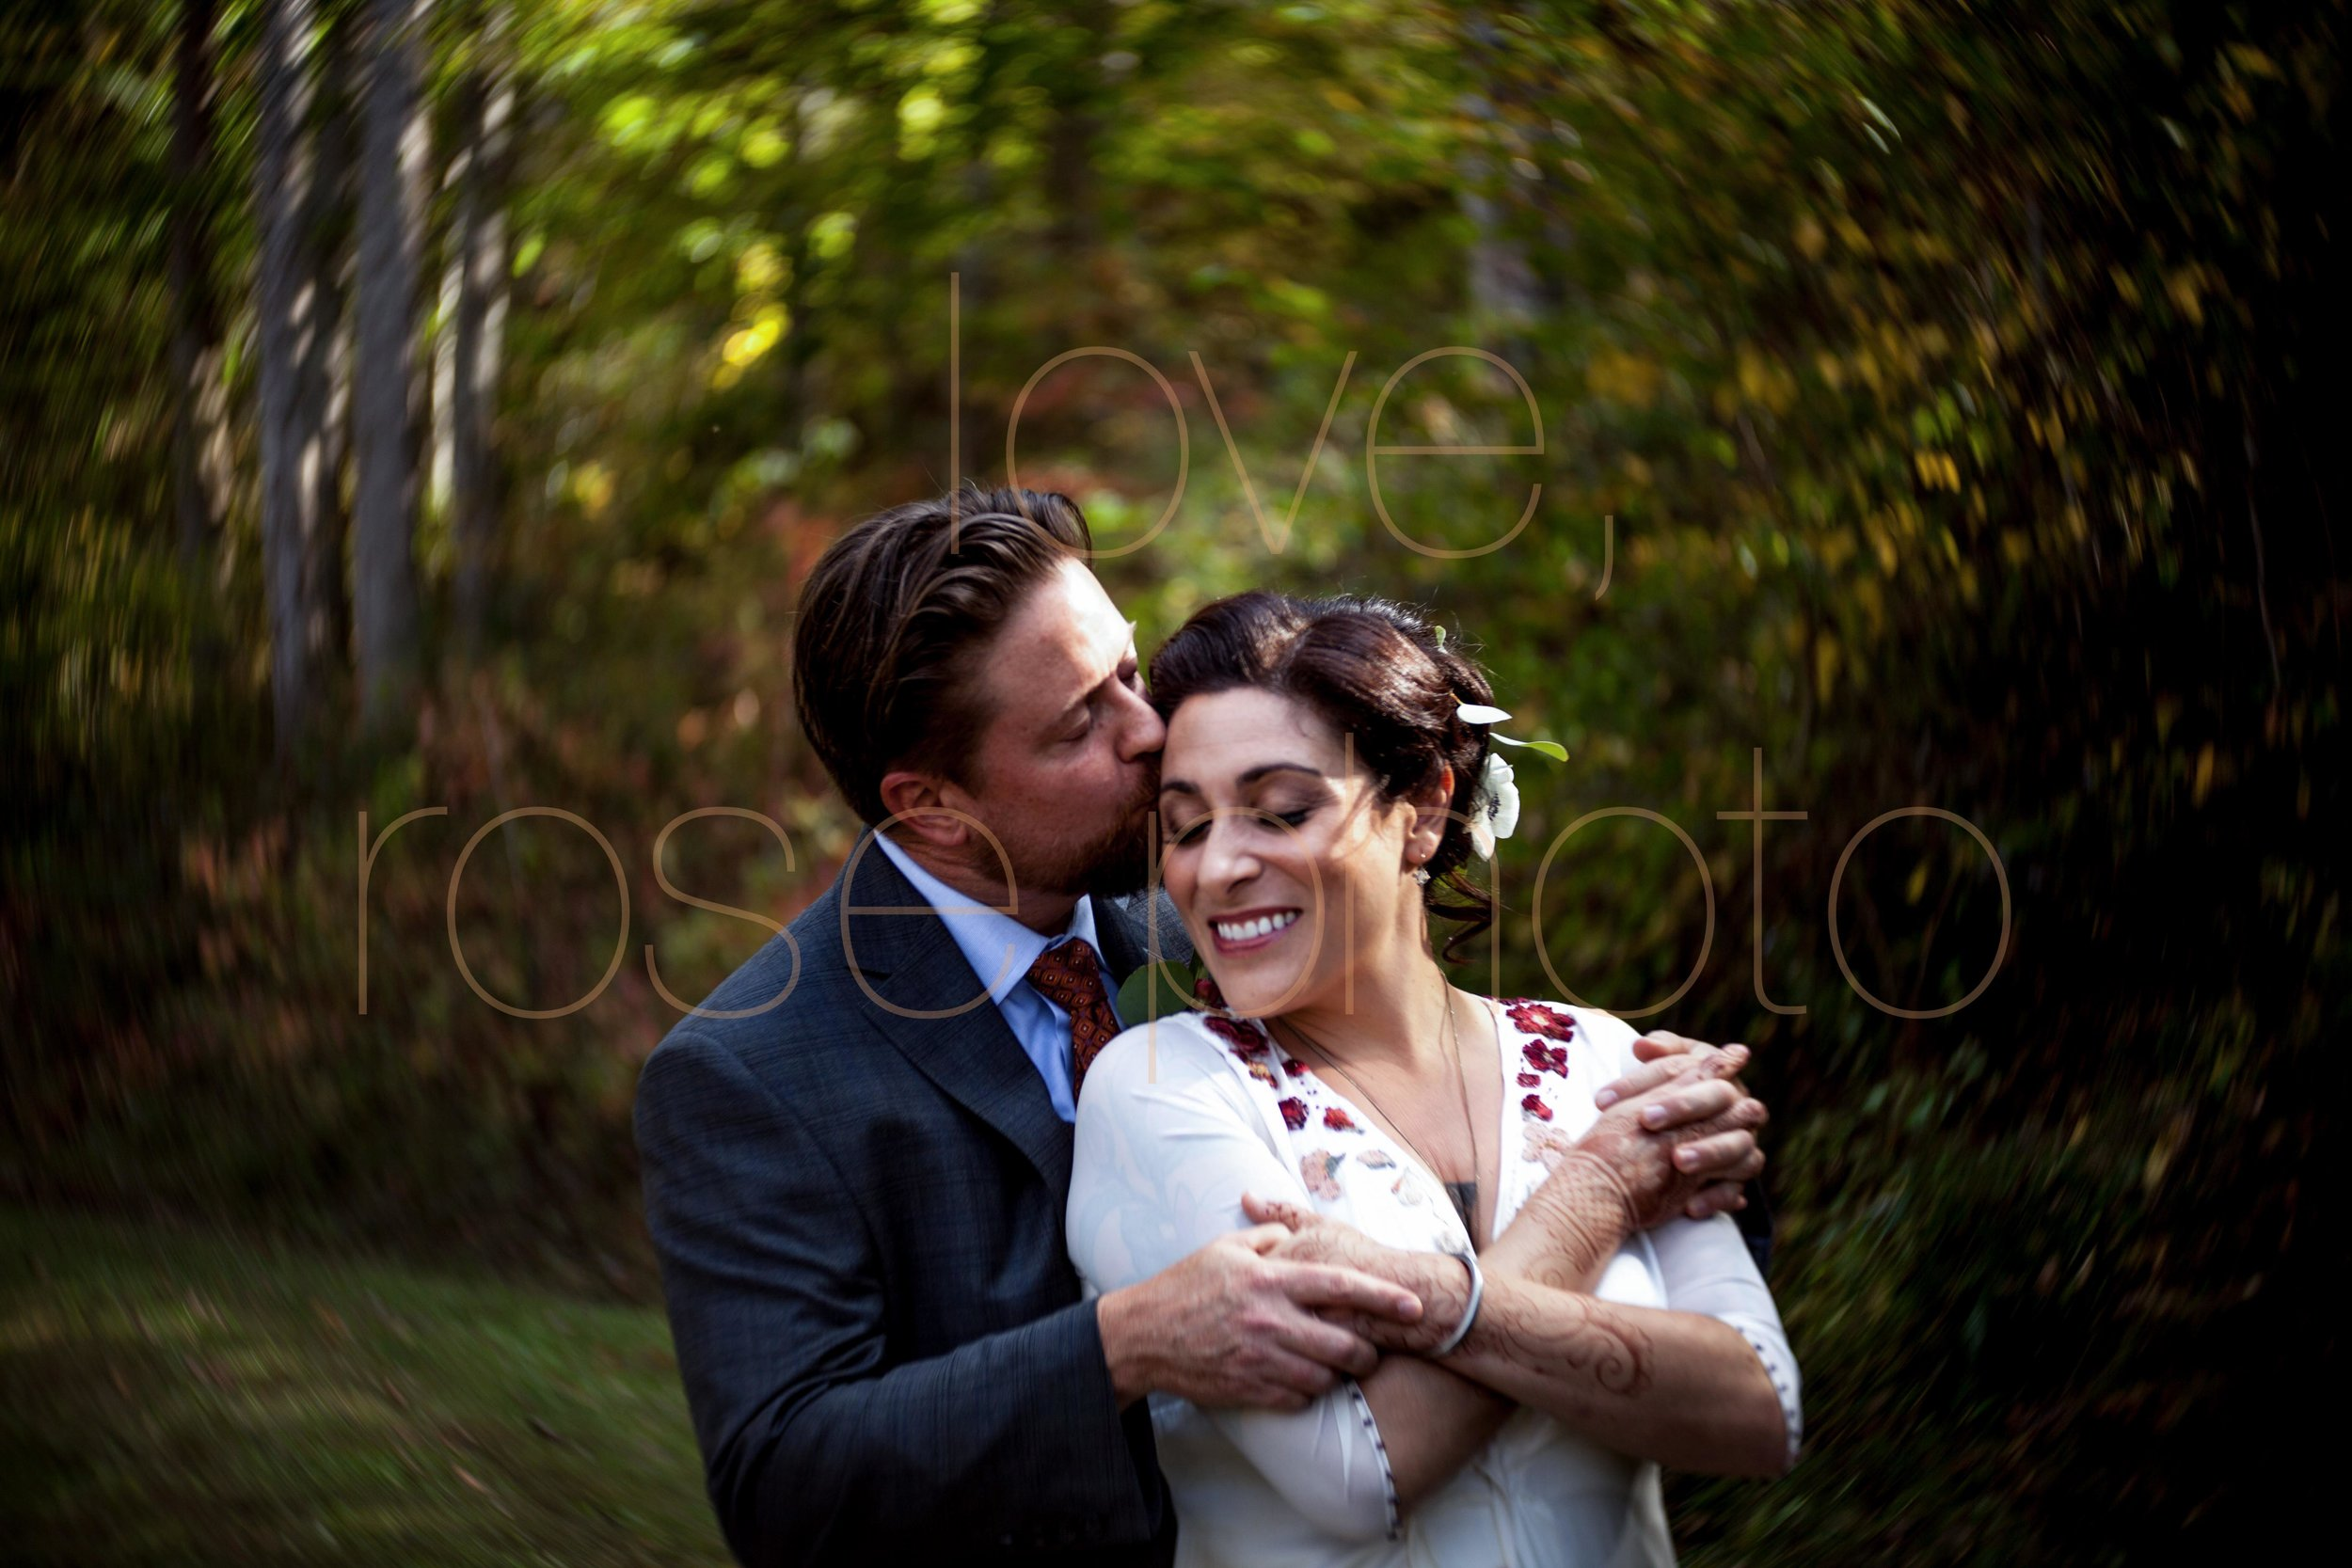 Jane Krame + Jason Ashevegas married asheville best wedding photographers -24.jpg